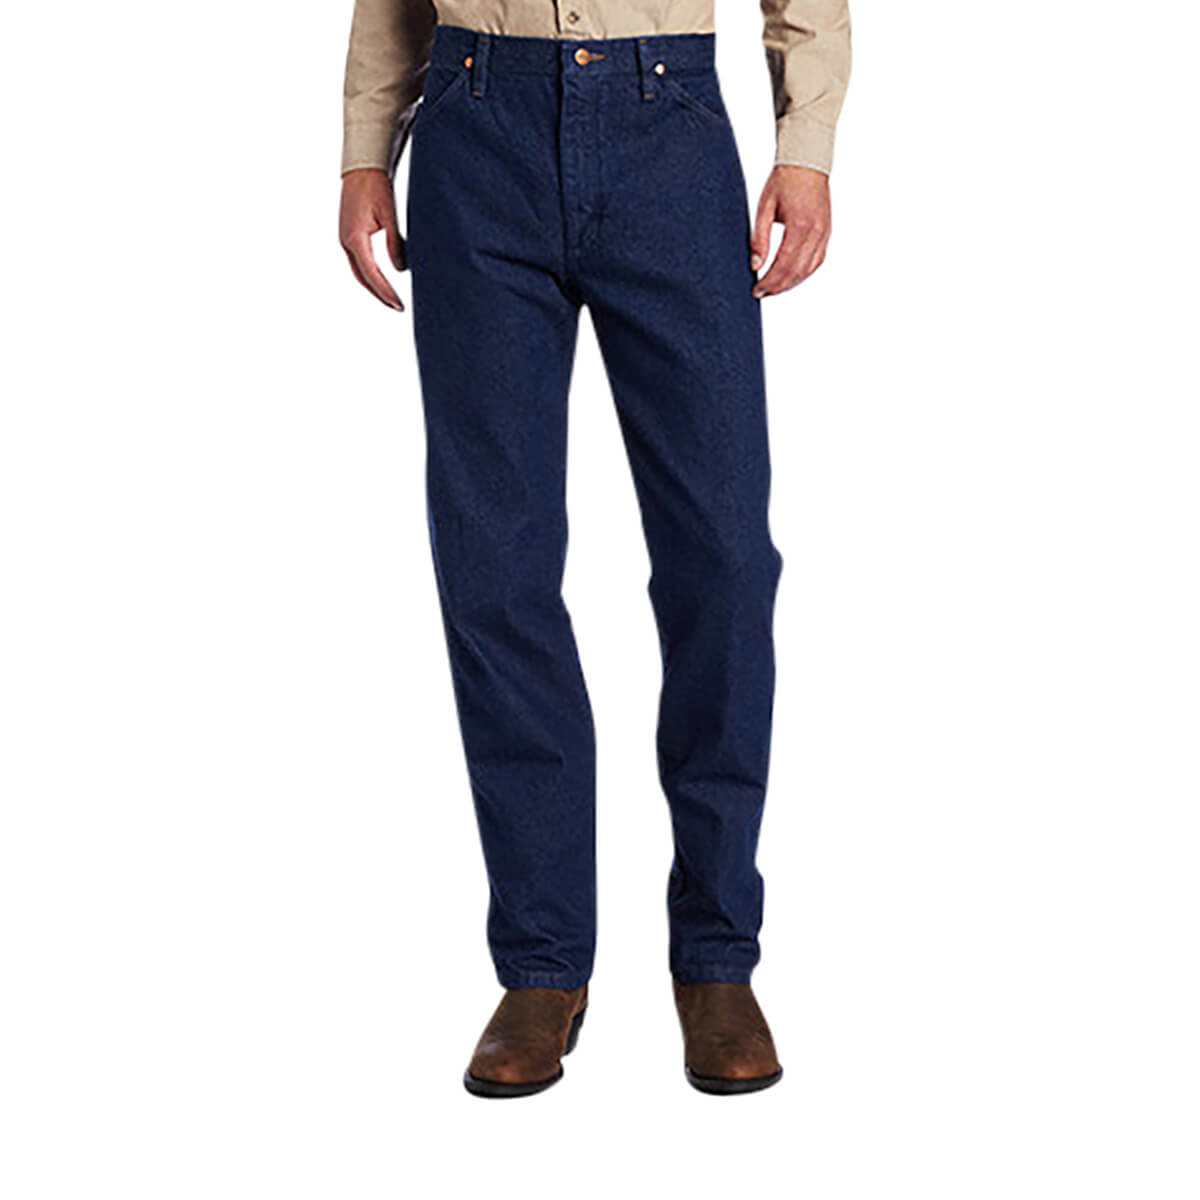 Wrangler Pro Rodeo Jeans Blue